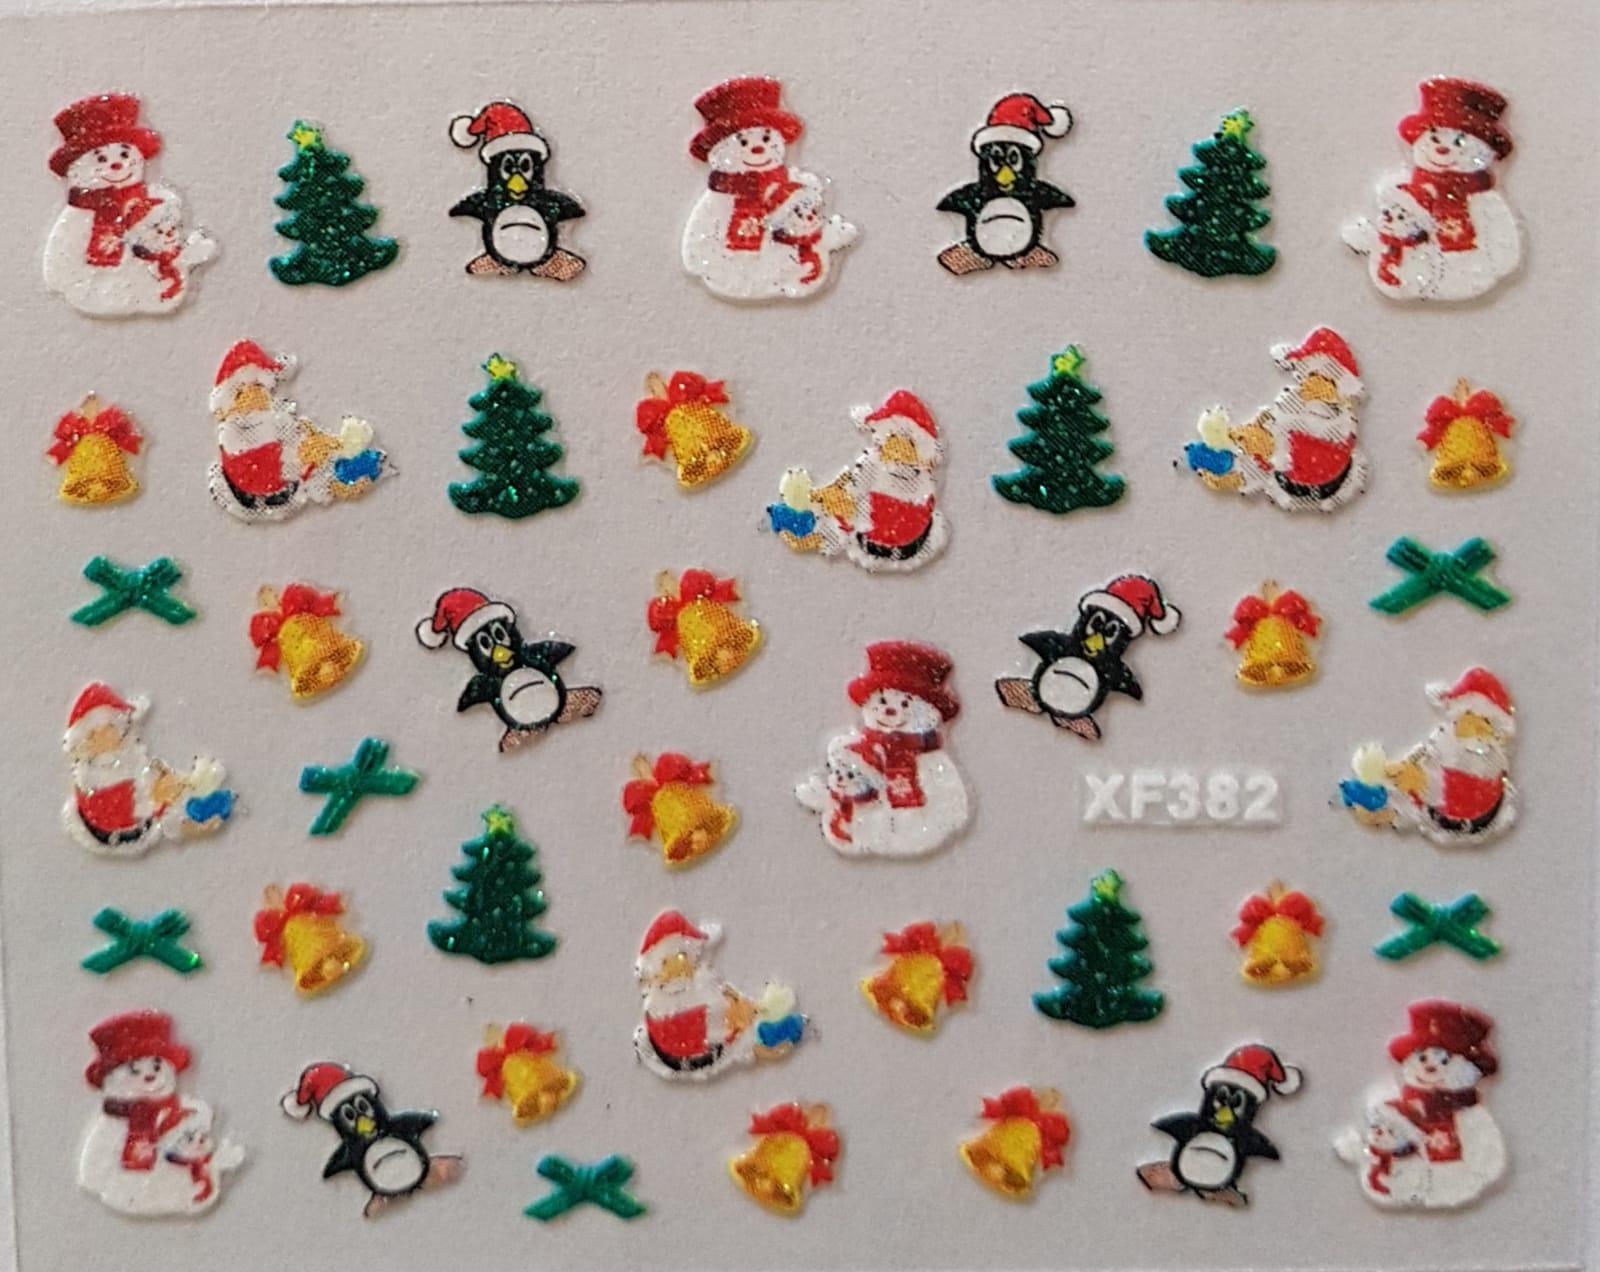 Stickers navideños xf-382